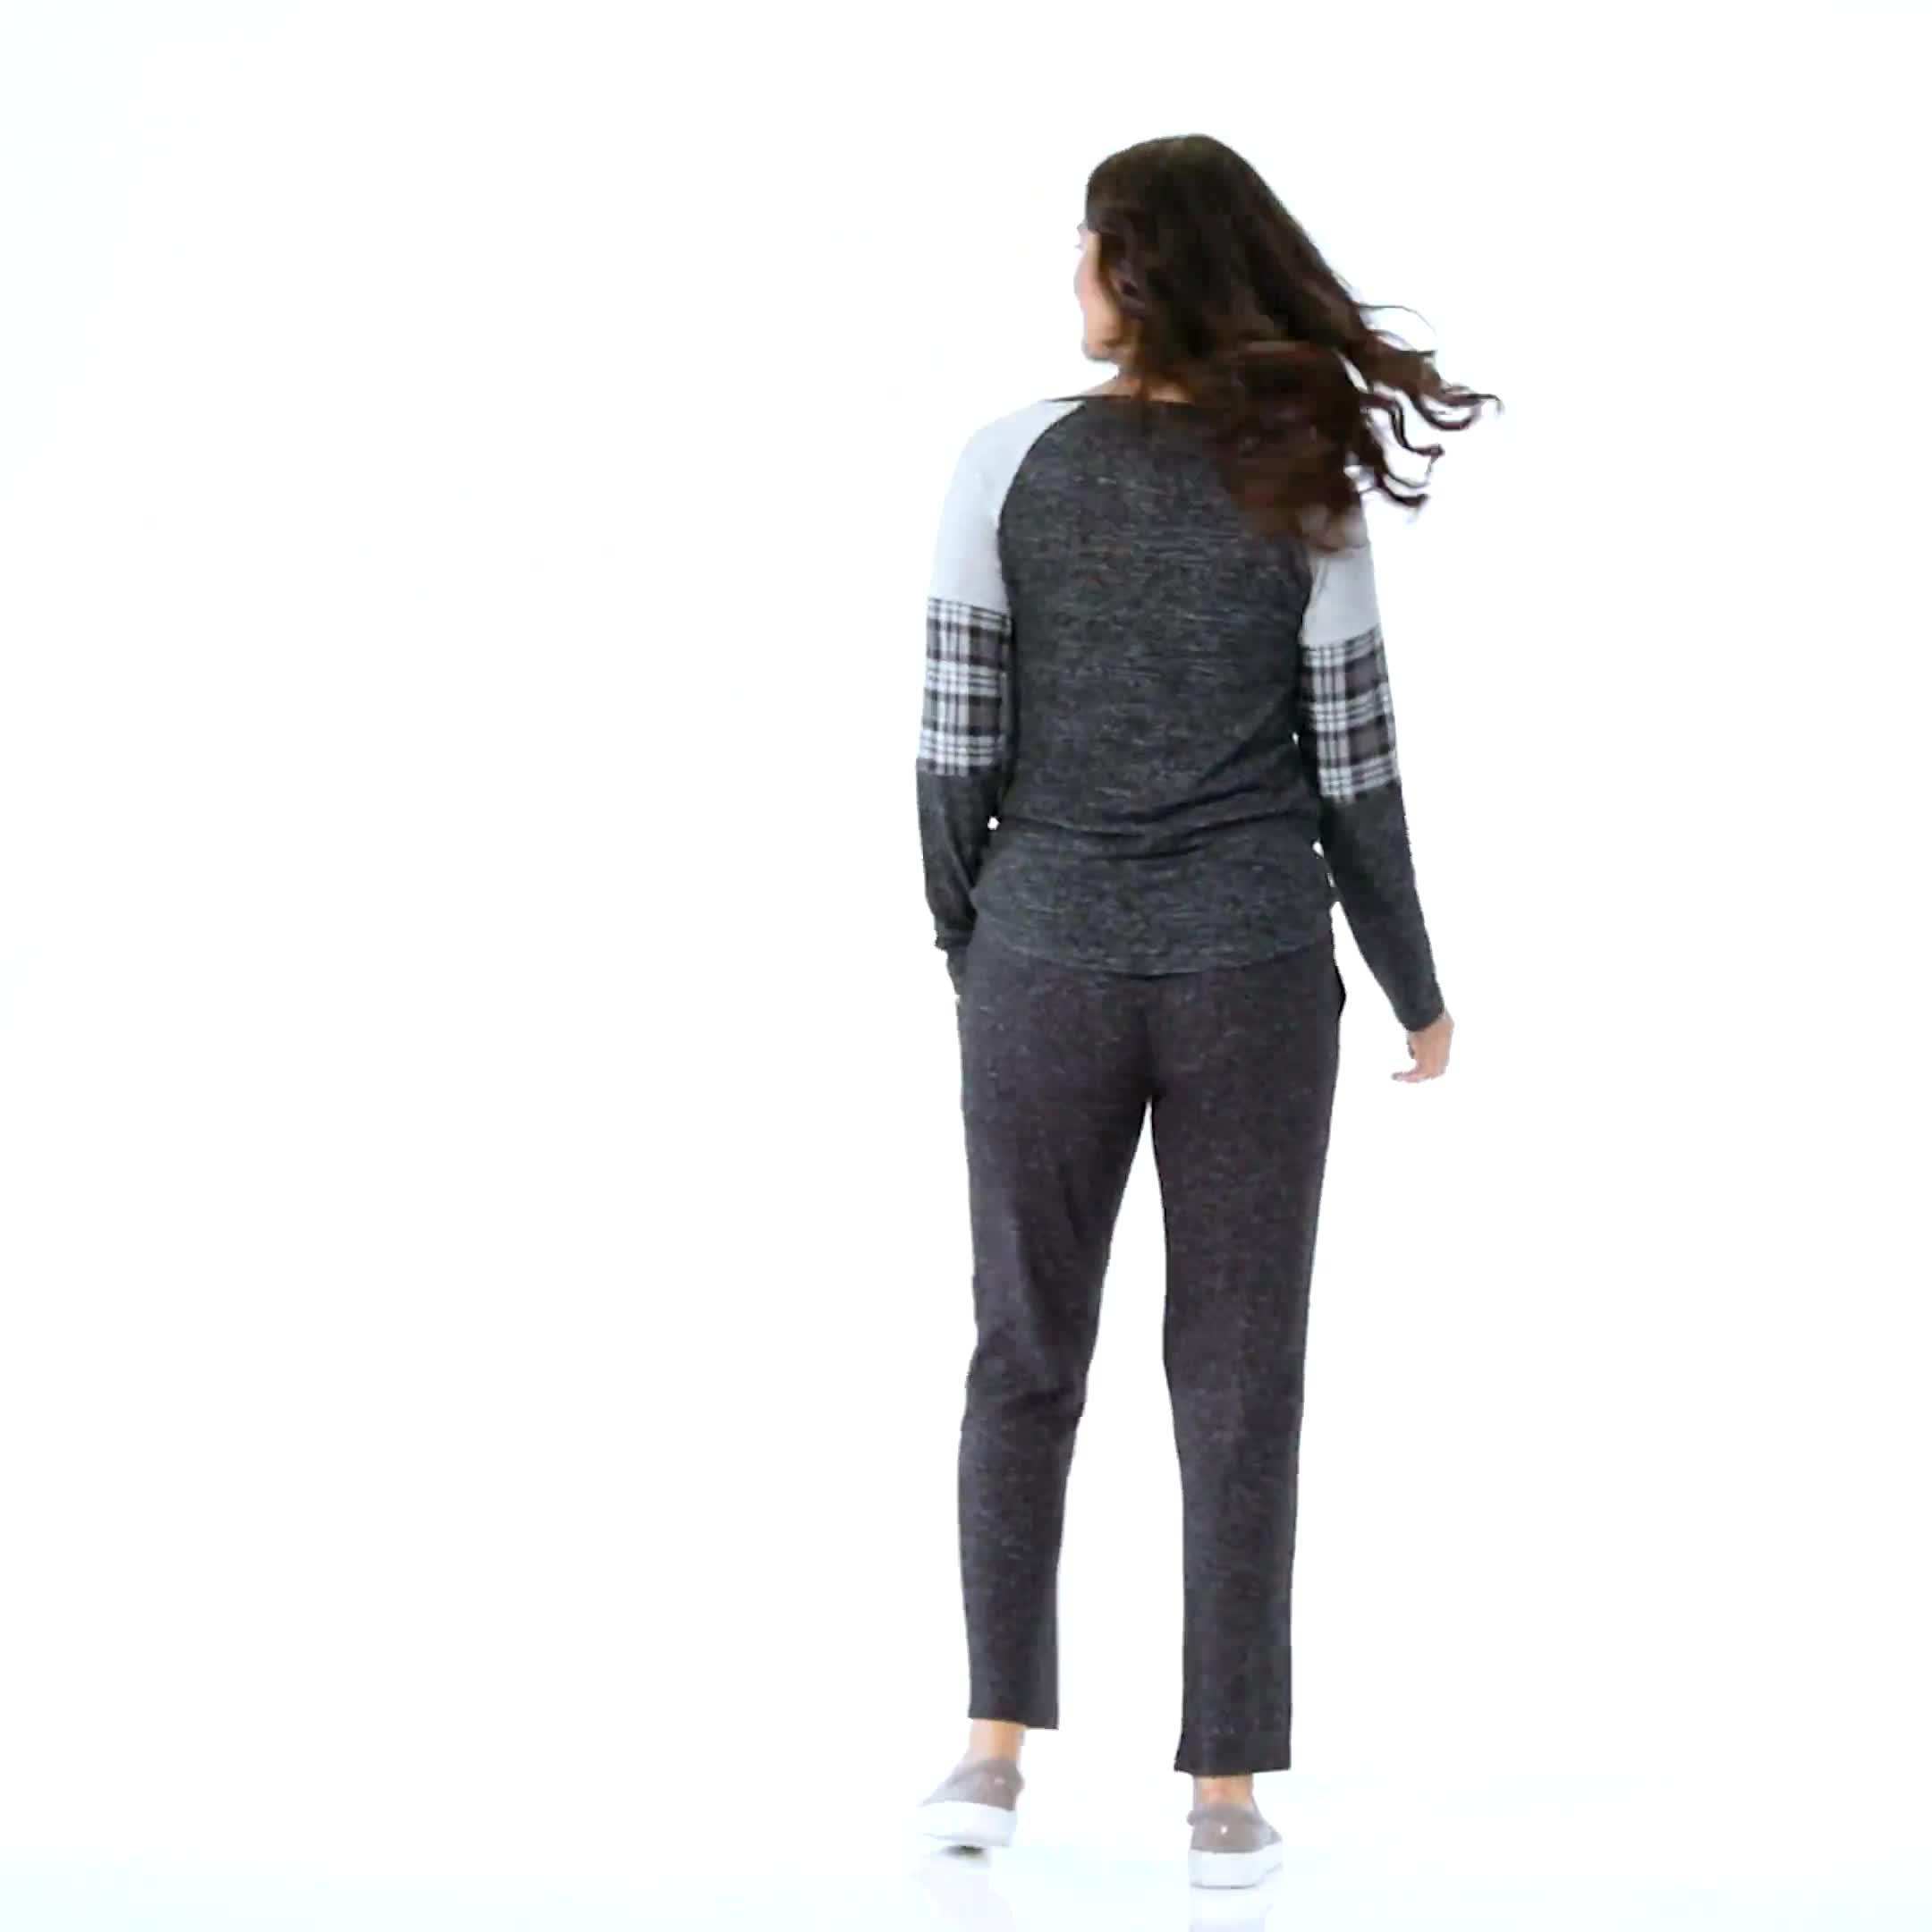 Westport Hacci Sweater Knit Twist Front Top - Video